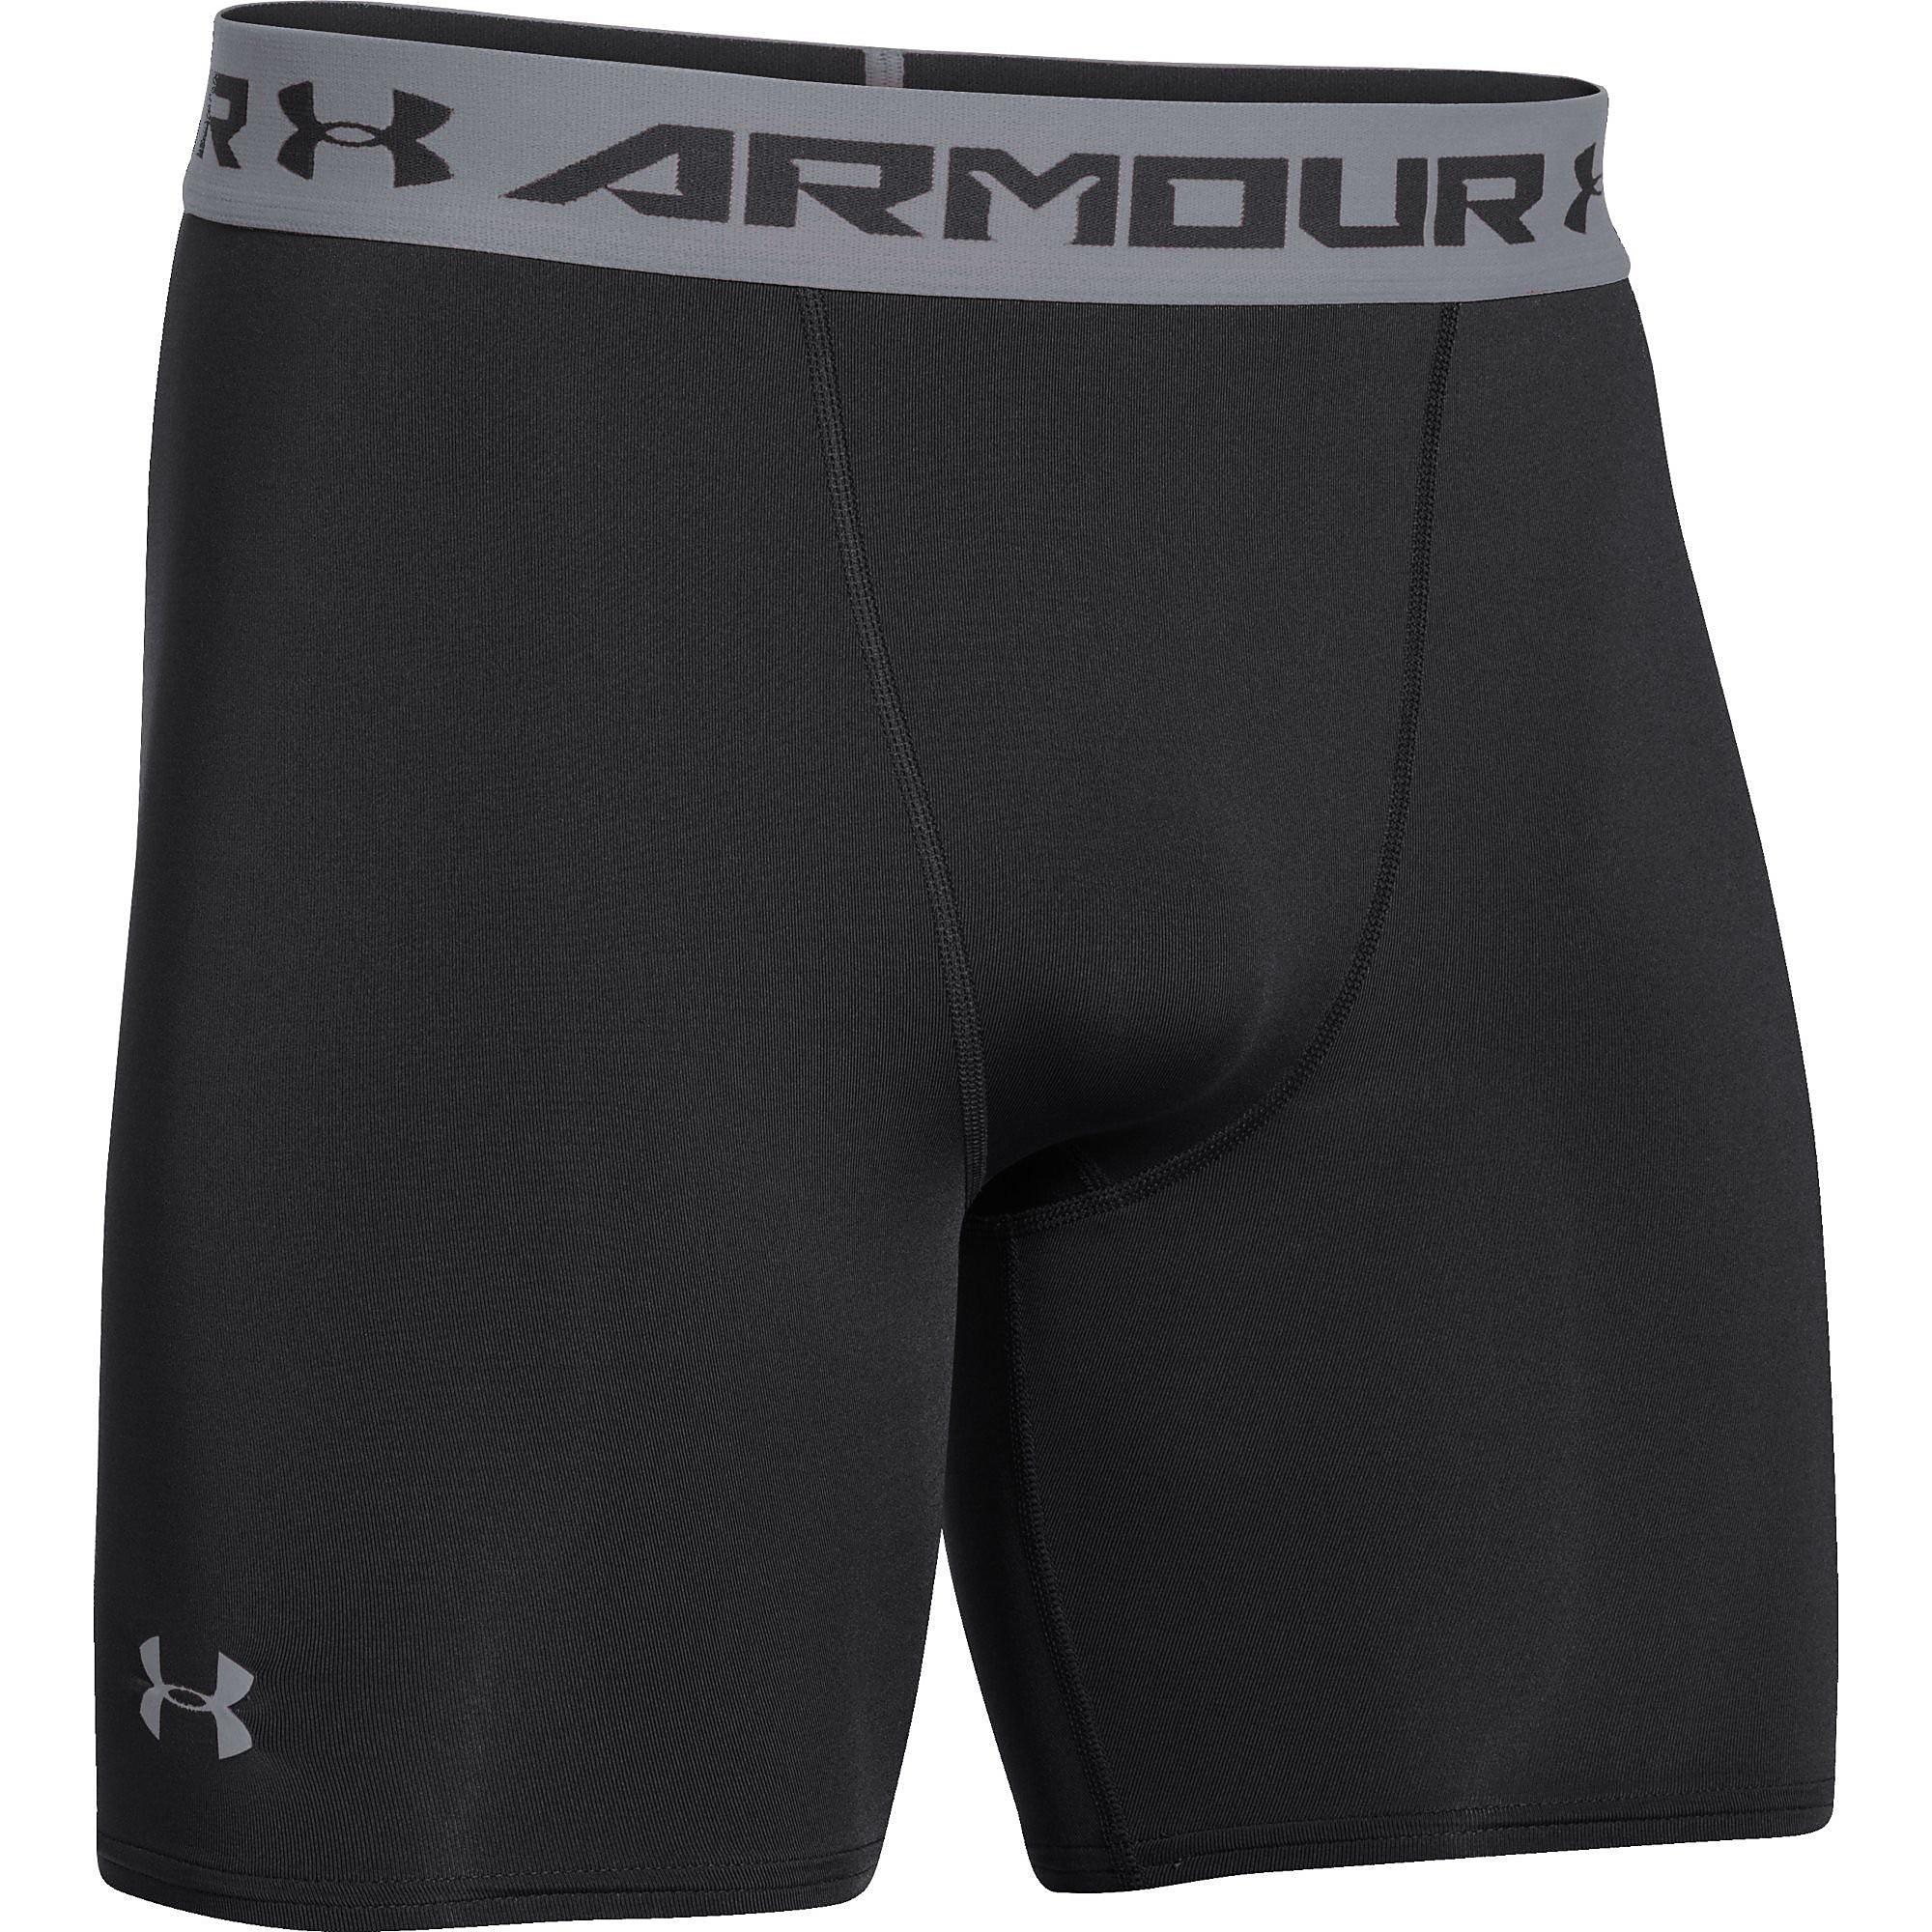 Under Armour ARMOUR HG COMP SHORT